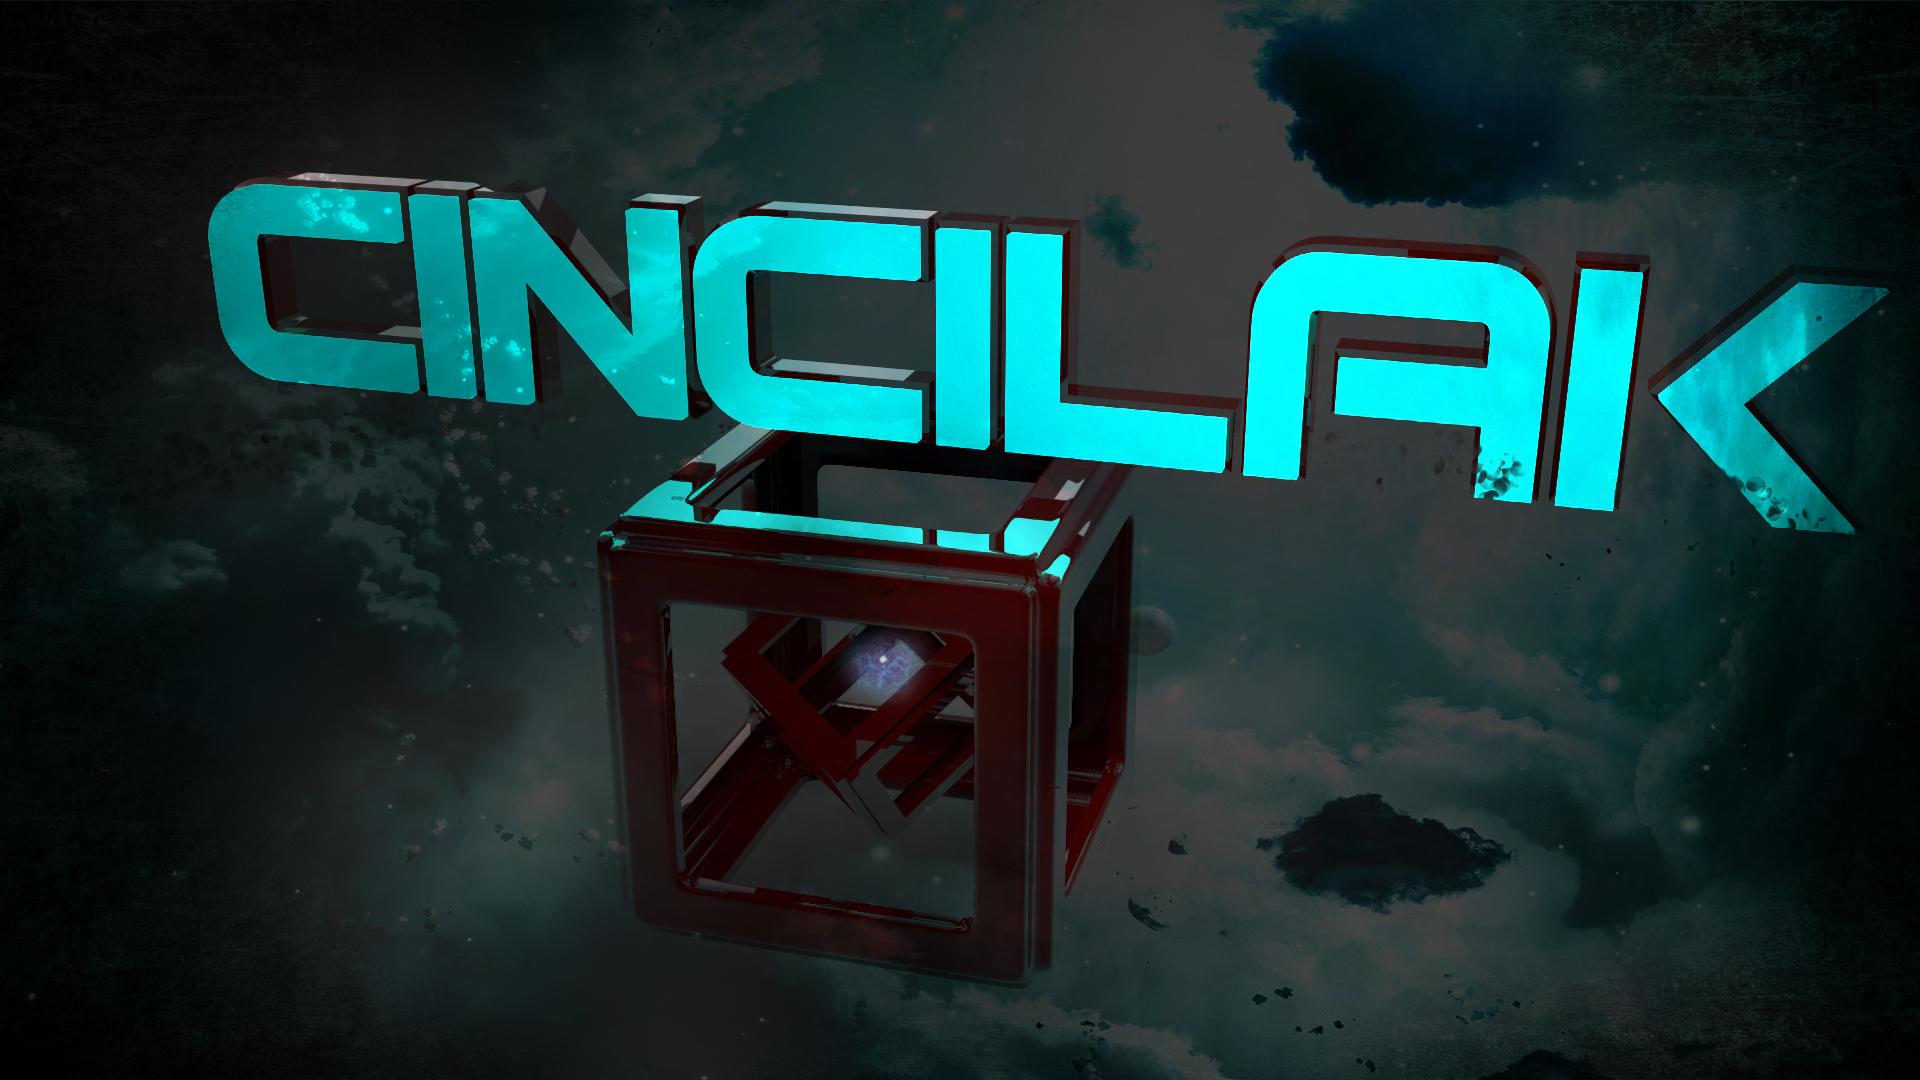 Skyblock by Cincilak